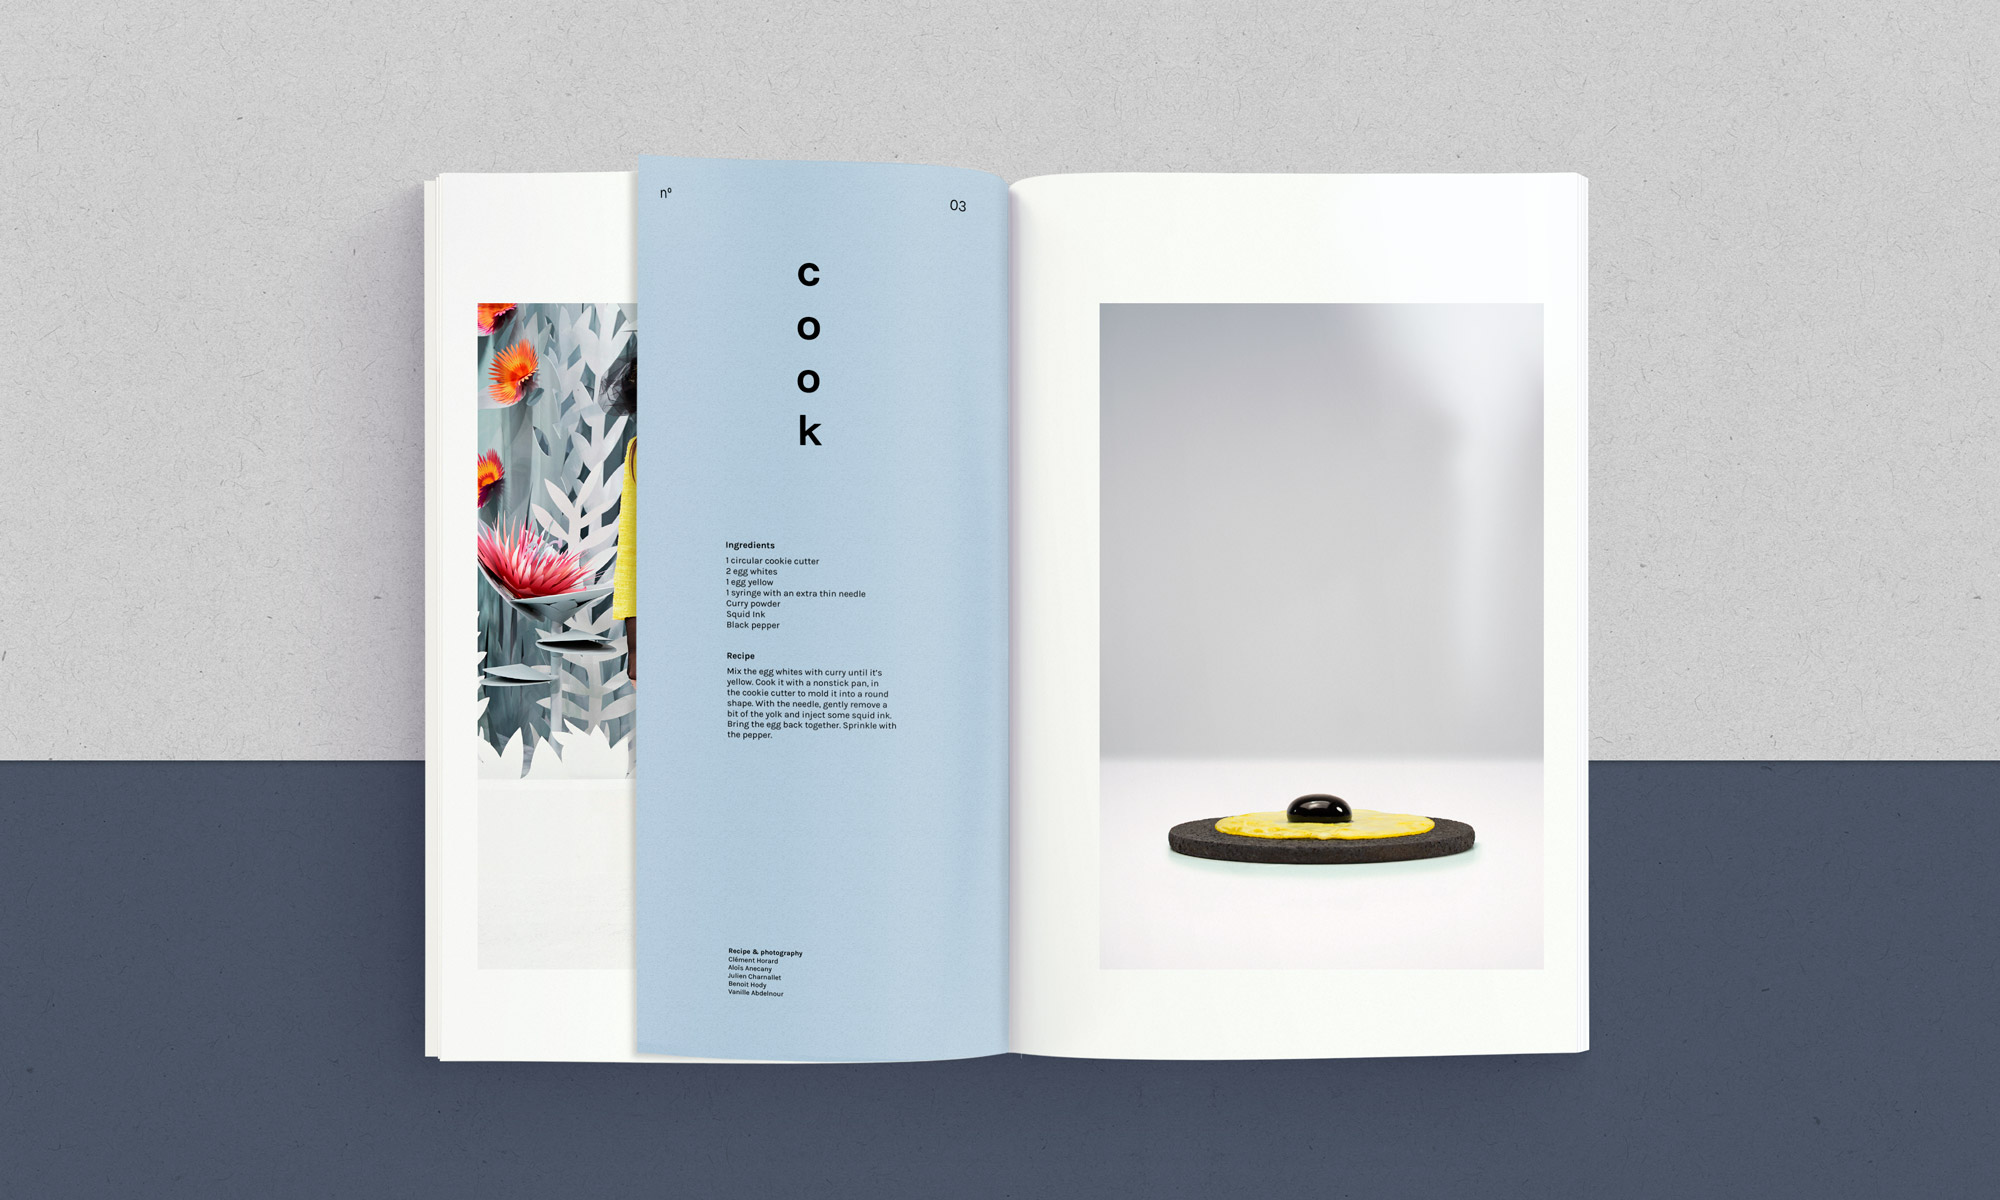 Berühmt Benoit Hody | Graphic design FX82